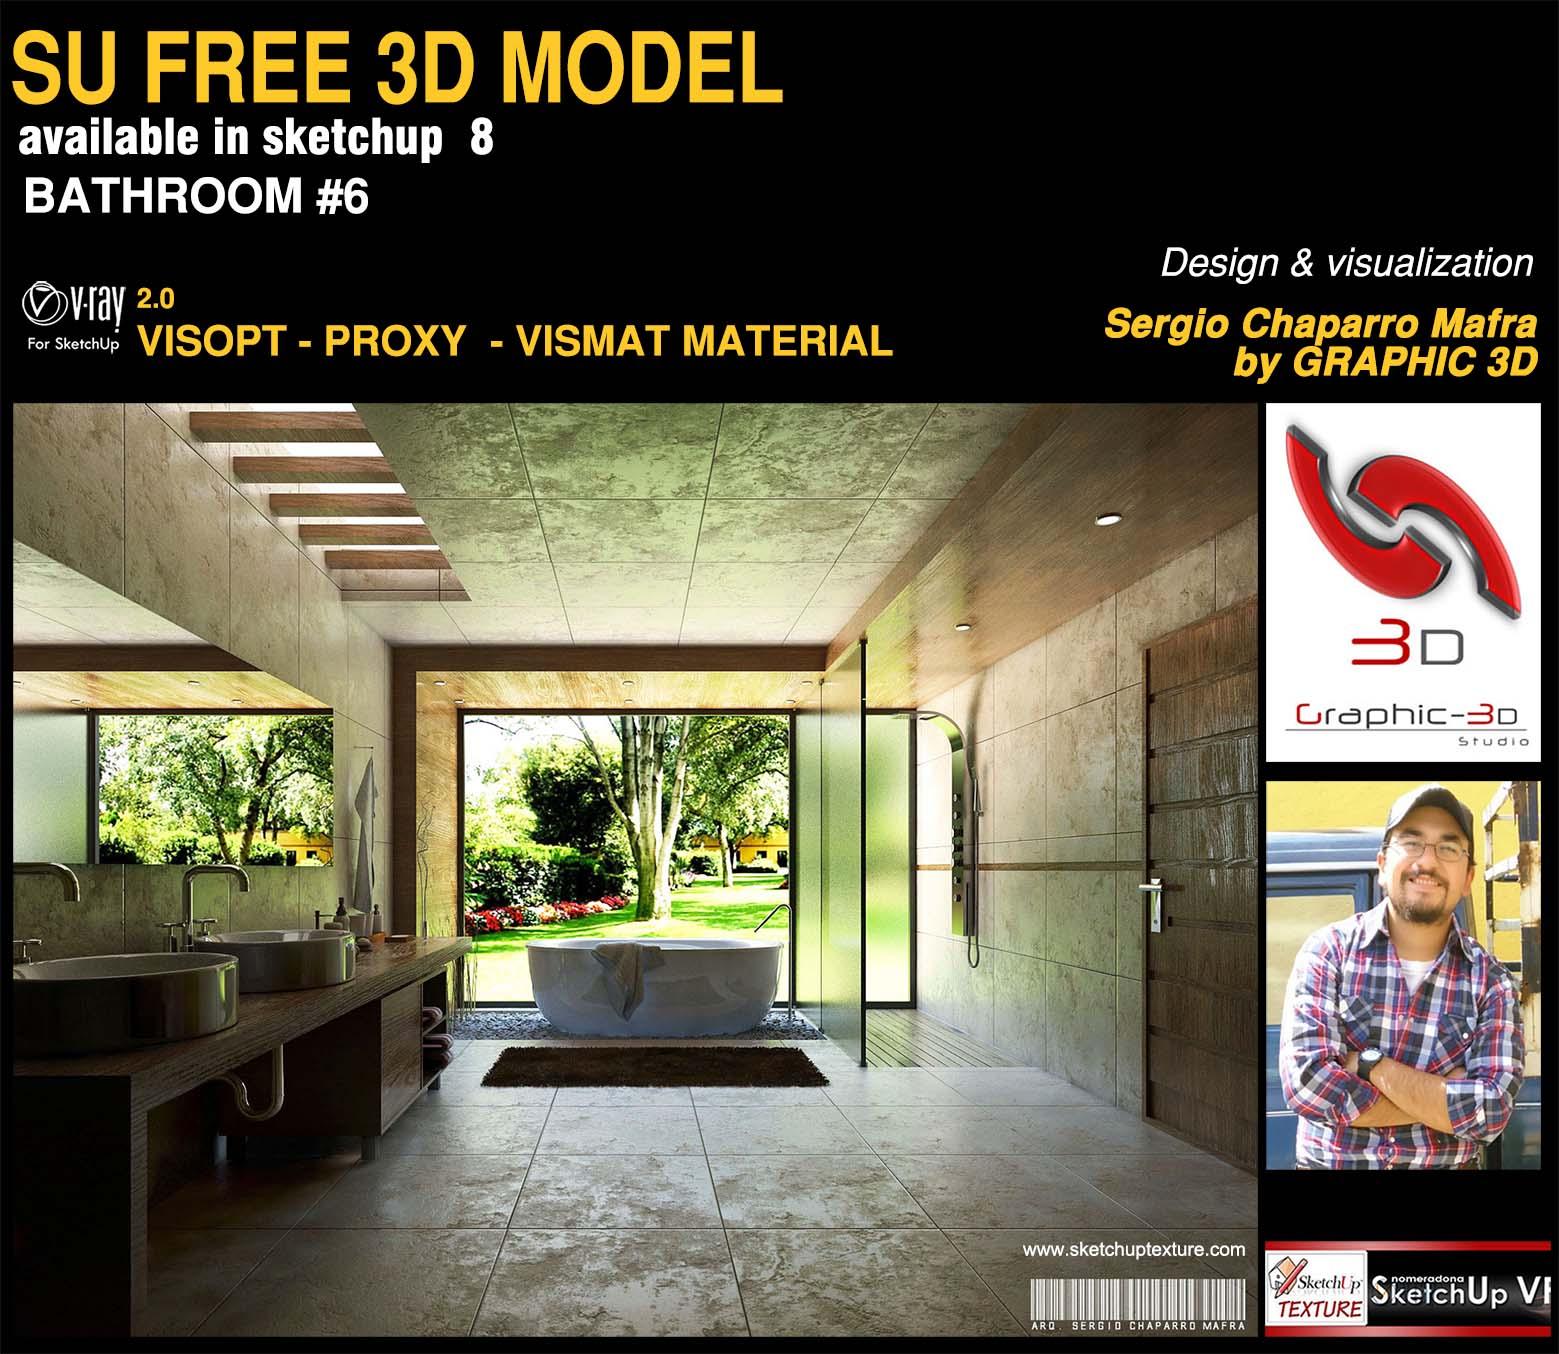 Free Sketchup 3d Model Bathroom 6 By Arq Sergio Chaparro Mafra